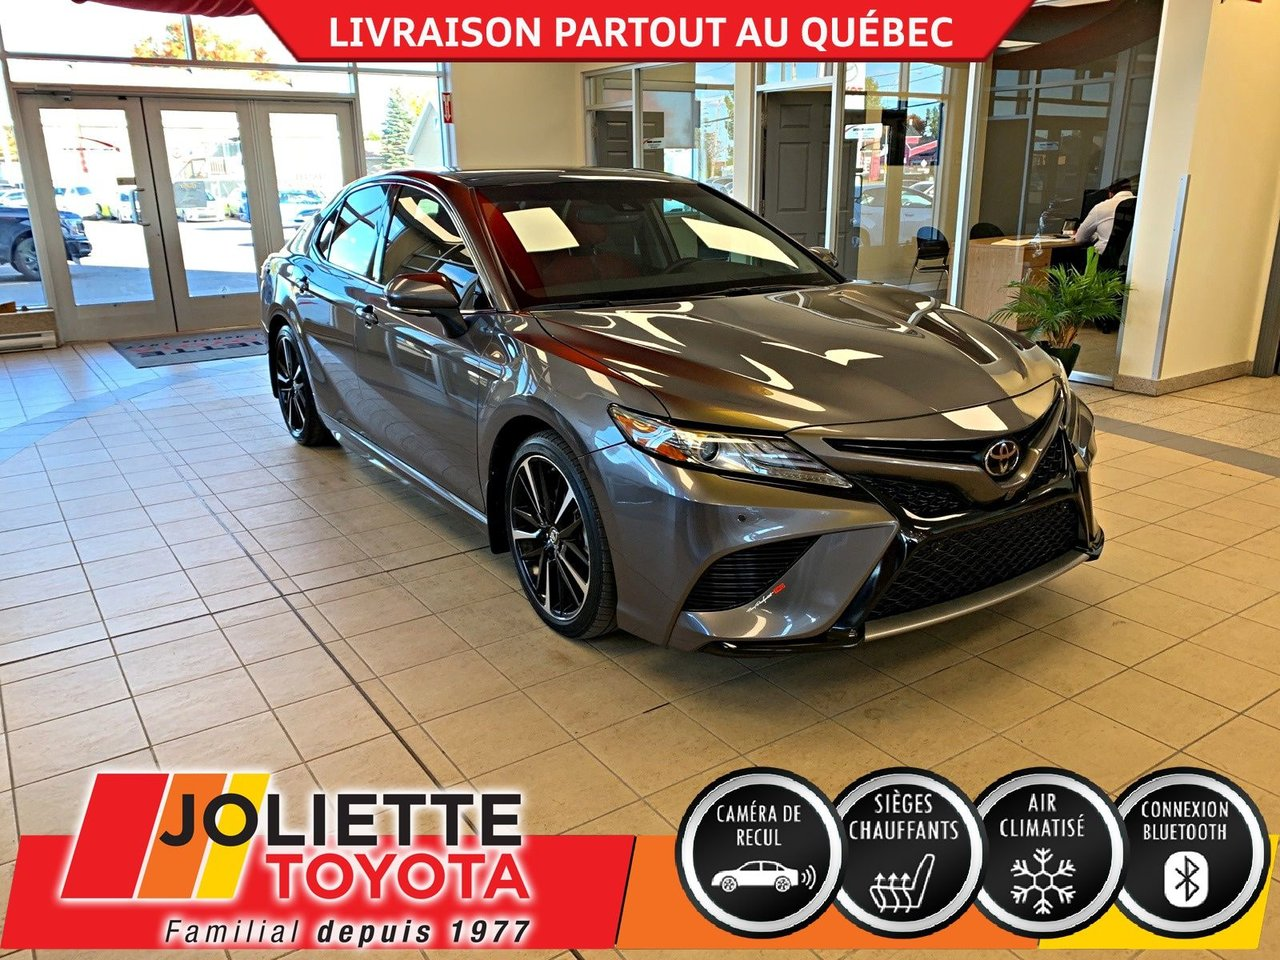 2018 Toyota  Camry XSE,BLUETOOTH,A/C,CAMÉRA DE RECUL !!!!!